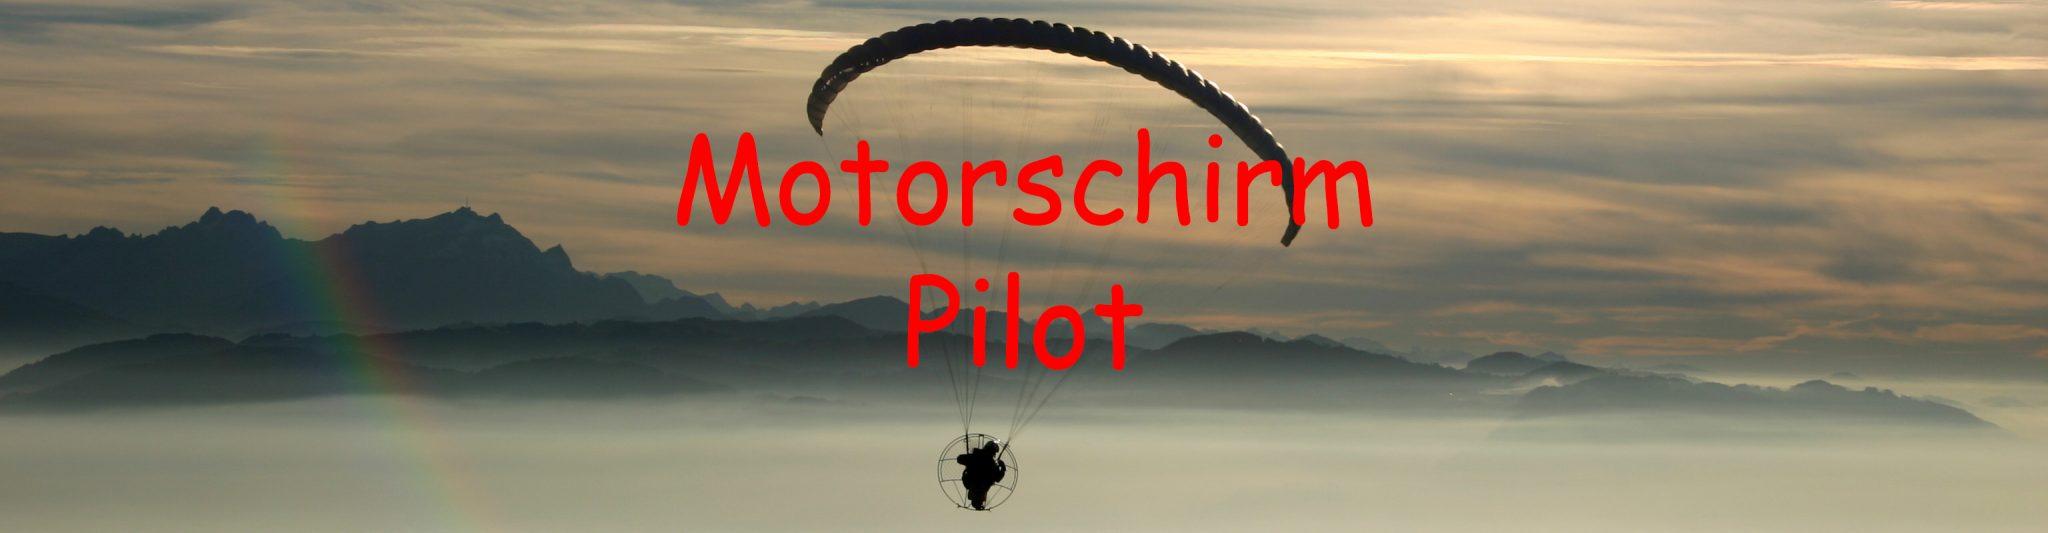 Motorschirmpilot